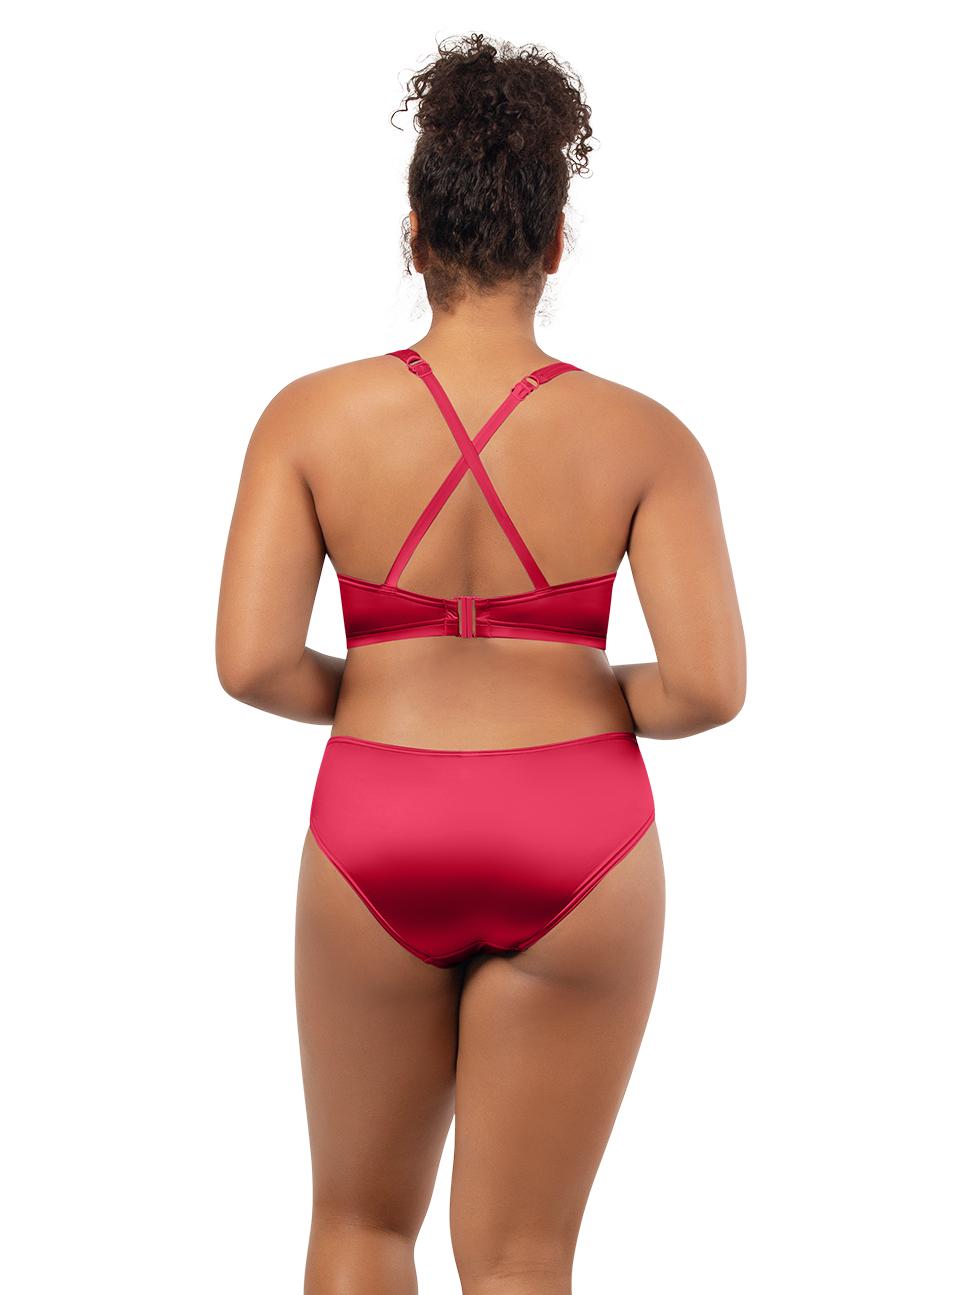 PARFAIT Rita LonglinePlungeTopS8142 Bikini BottomS8143 Cherry Black - Rita Longline Plunge Top Cherry S8142